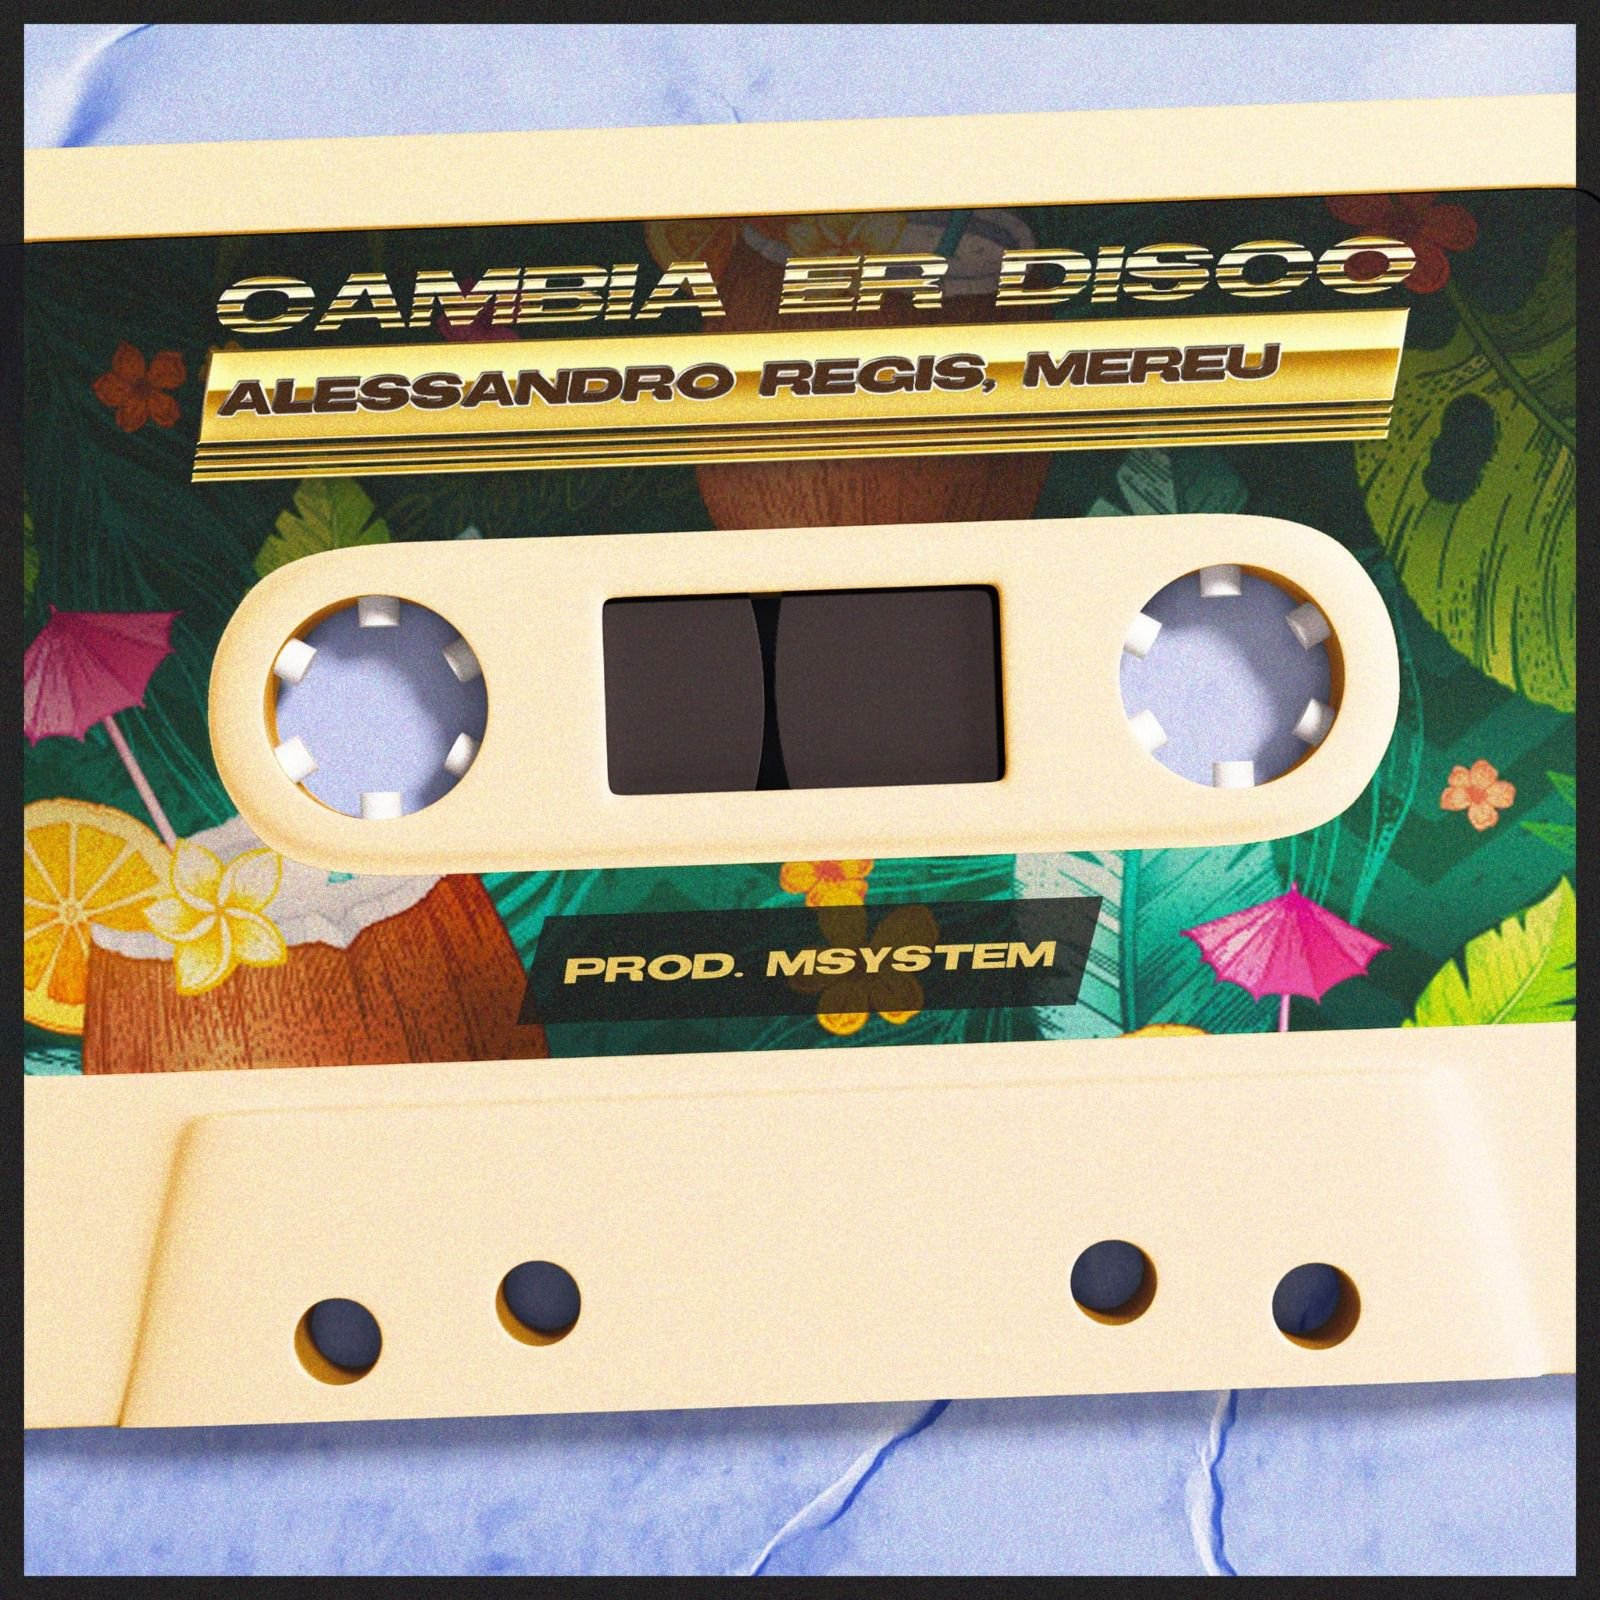 AUDIO CASSETTA CAMBIA ER DISCO